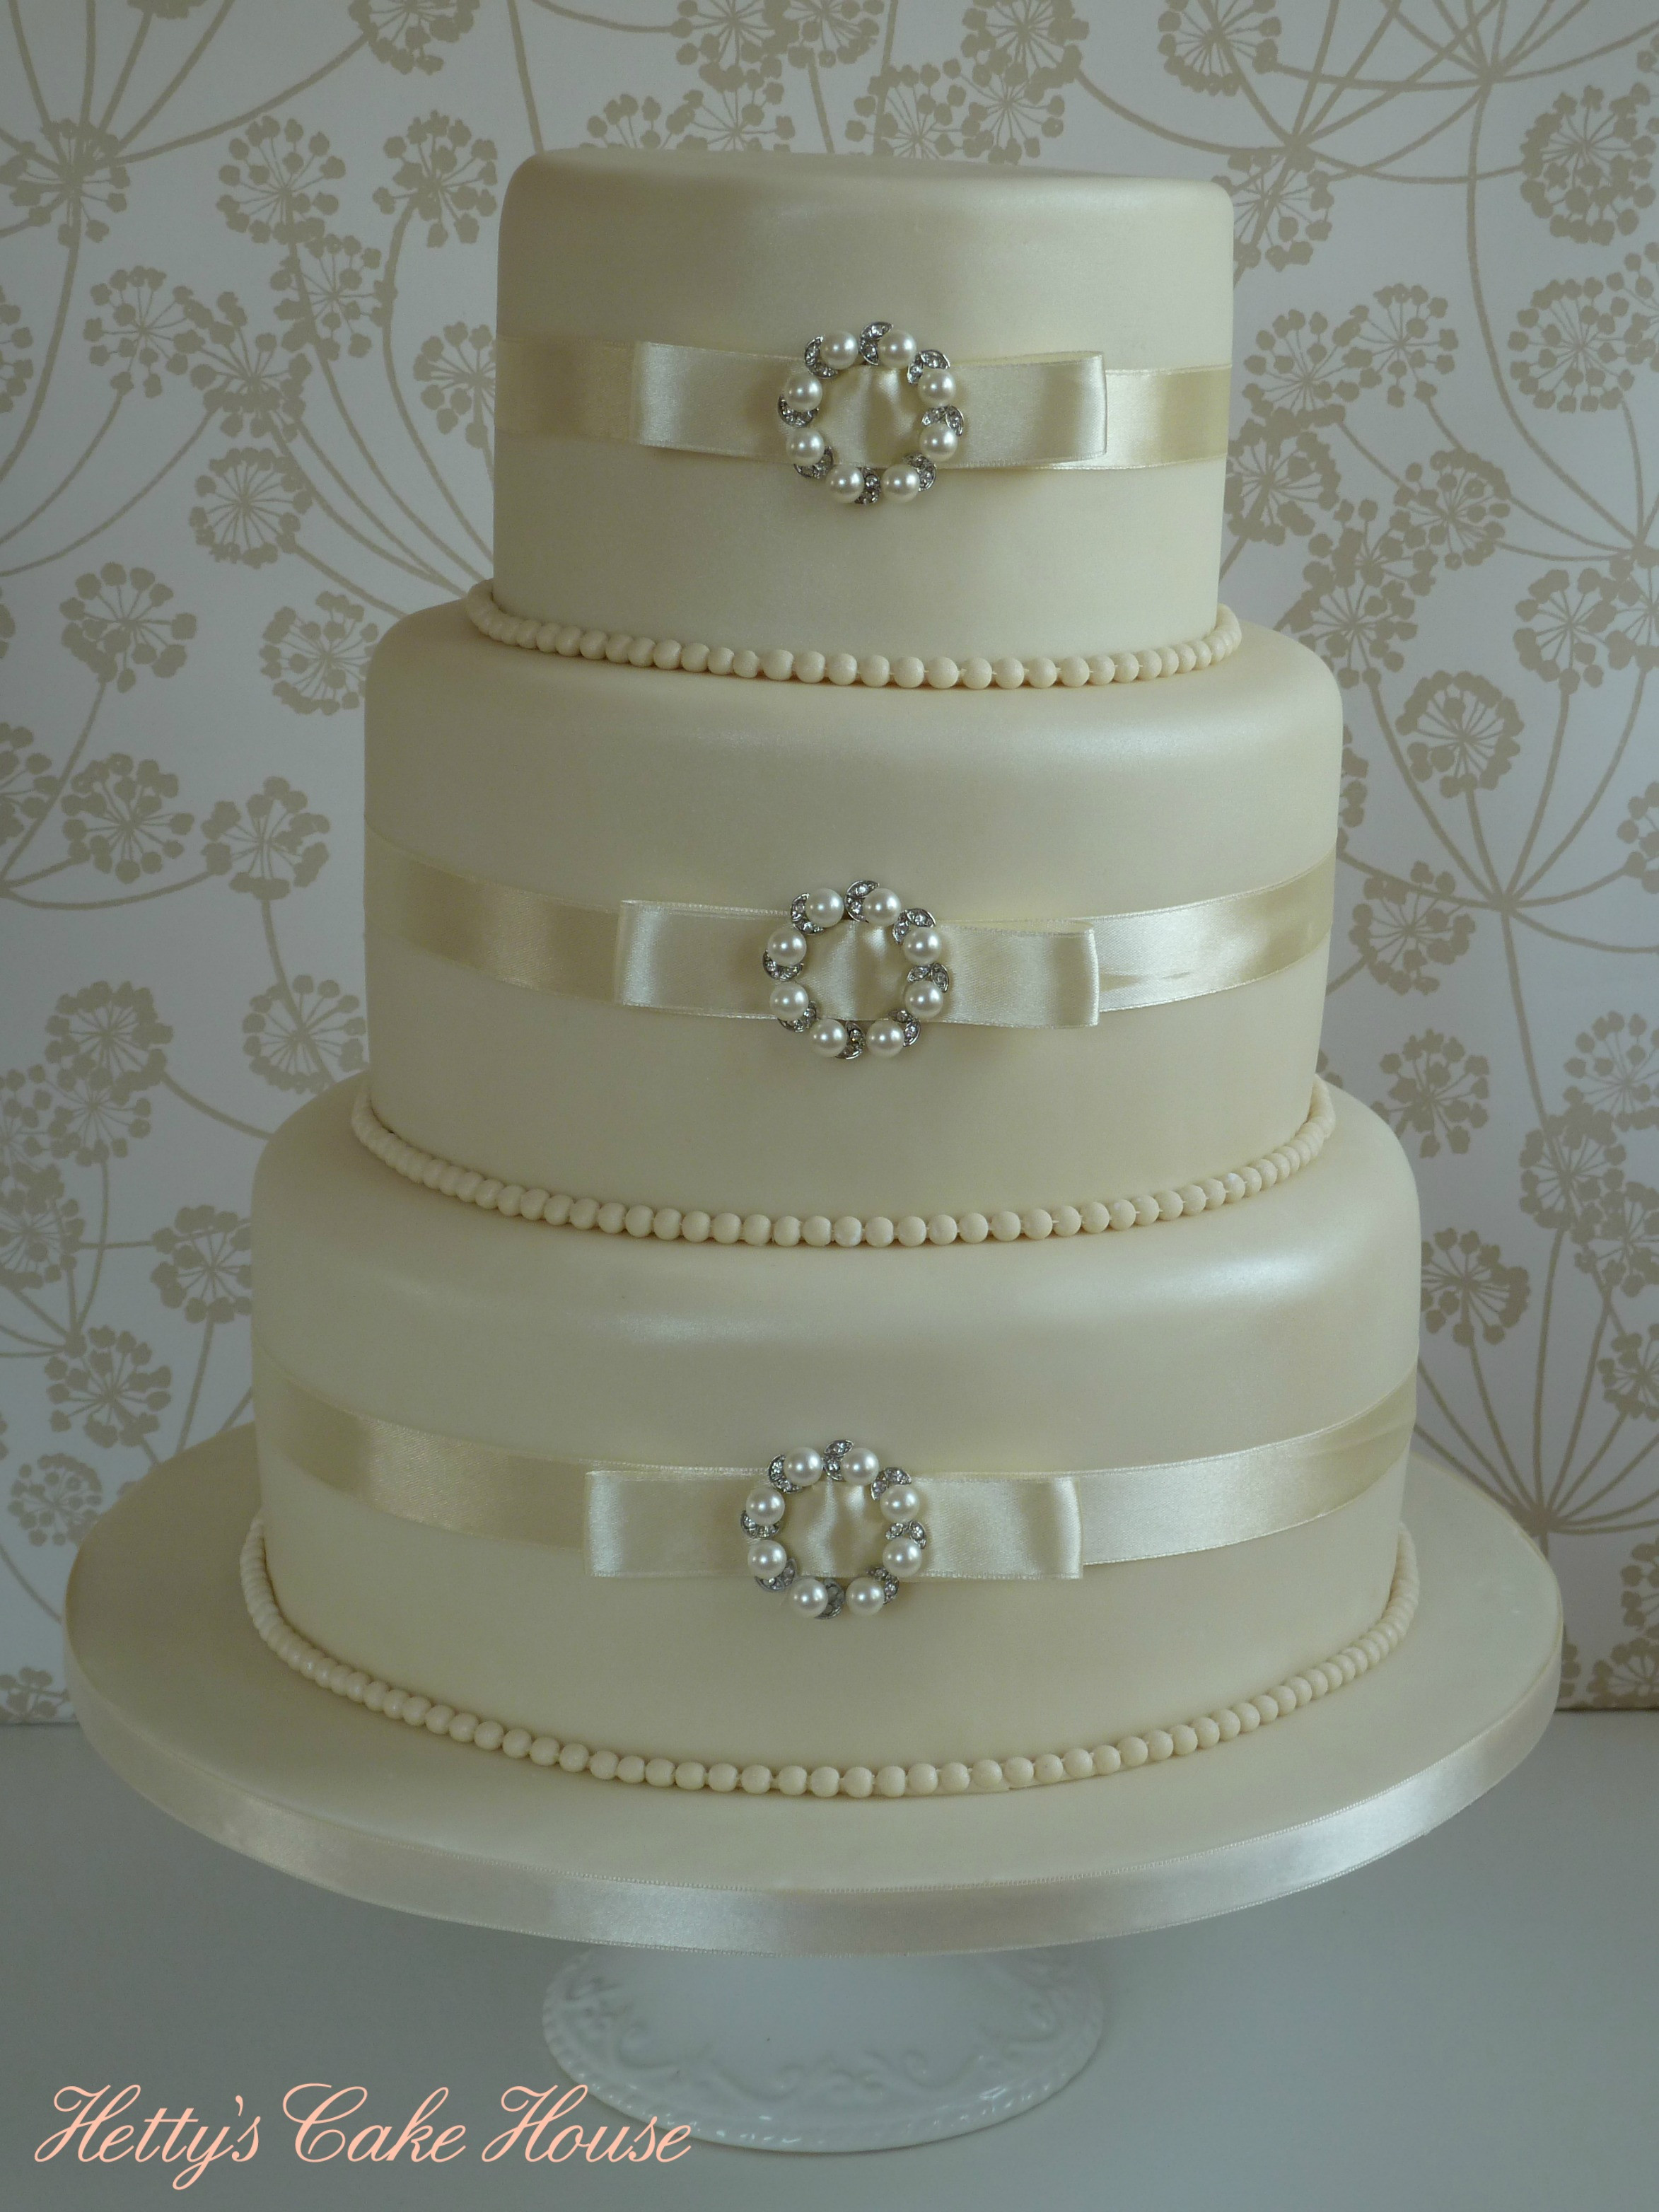 Wedding Cakes With Pearls  Wedding cakes Hettys Cake House